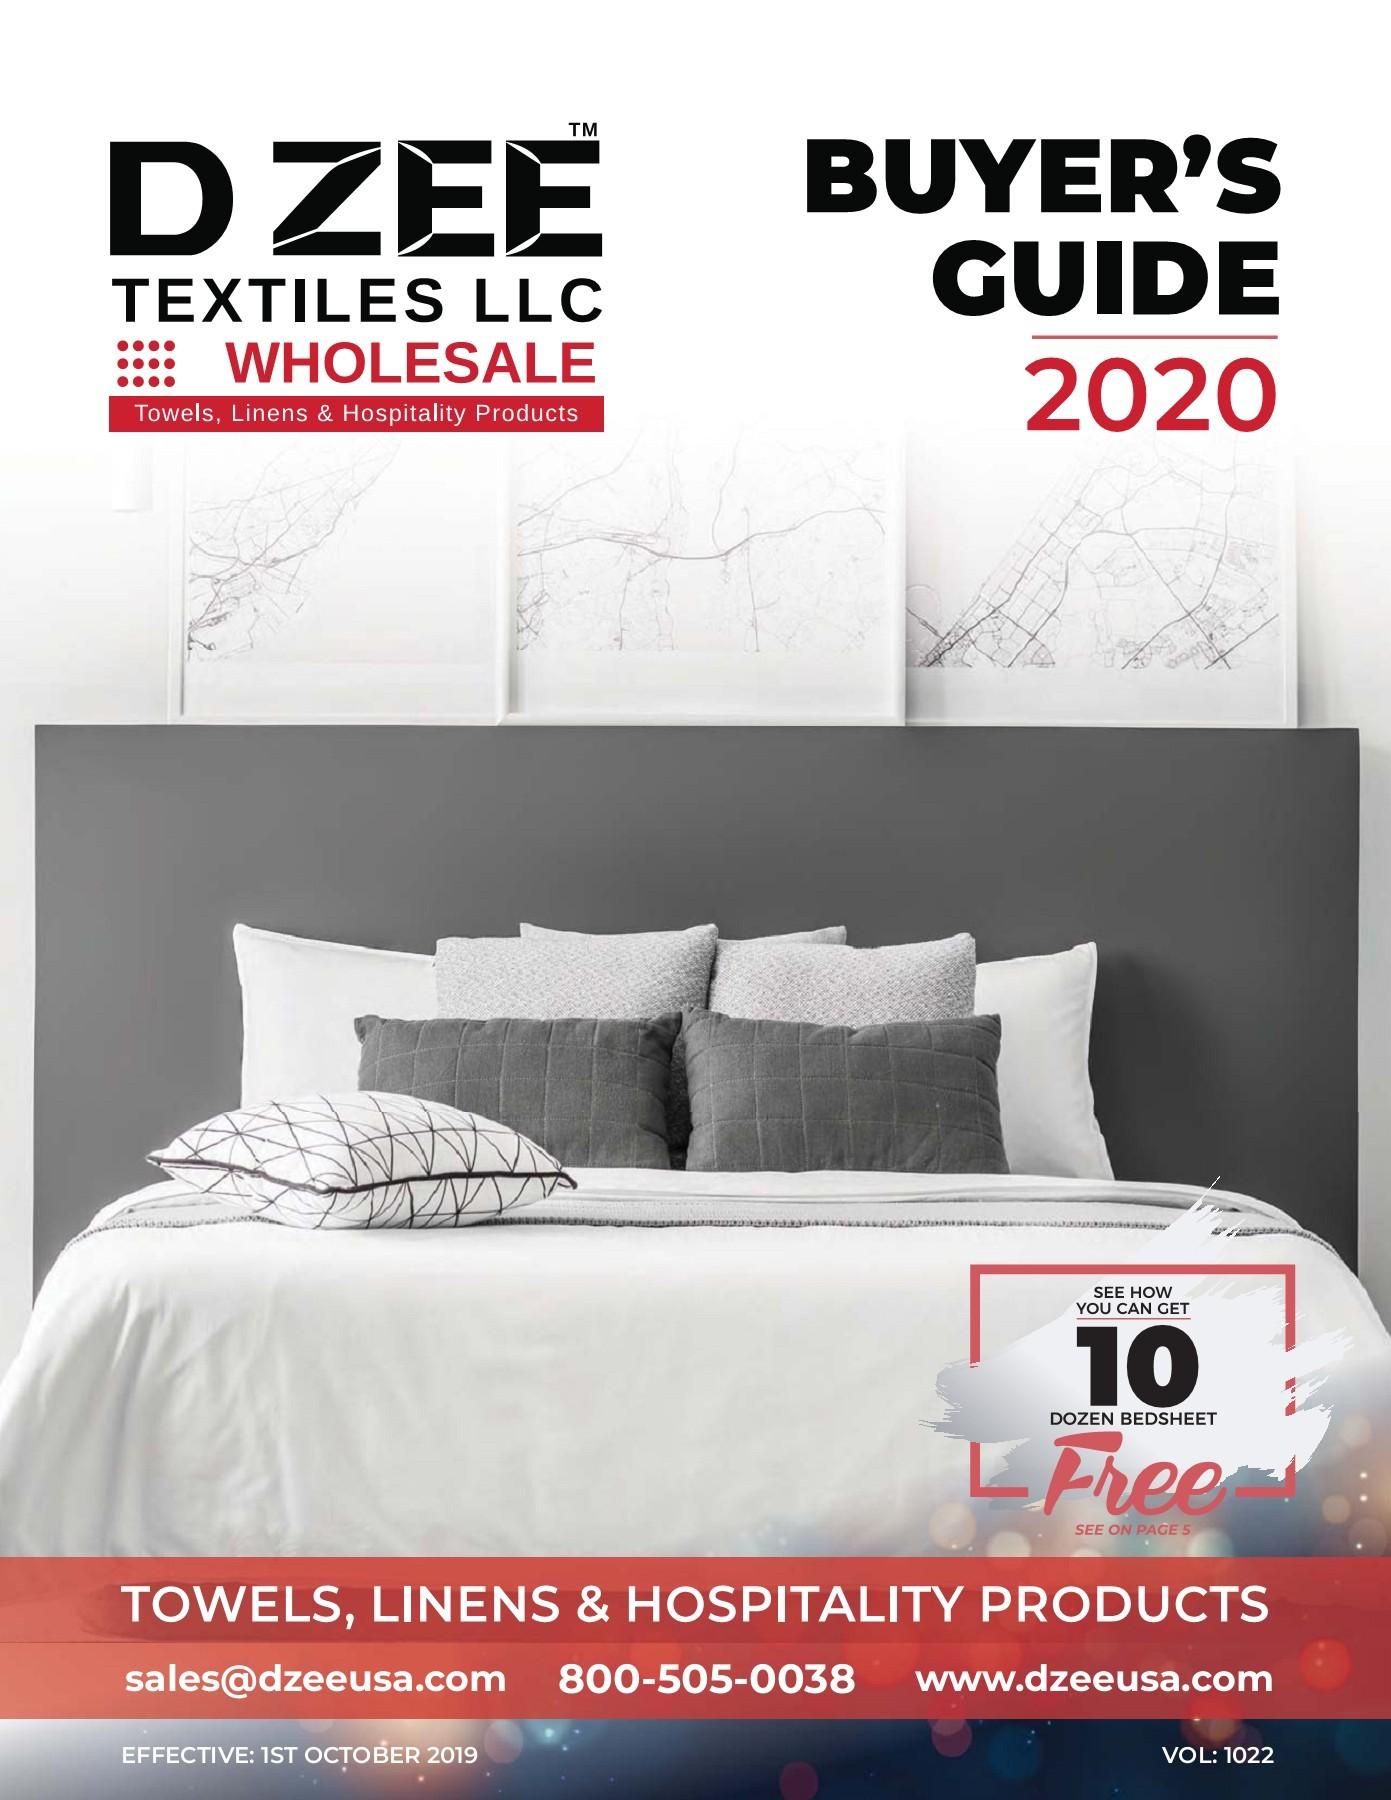 12 new white twin flat sheet white cotton rich 66x104 percale t200 premium